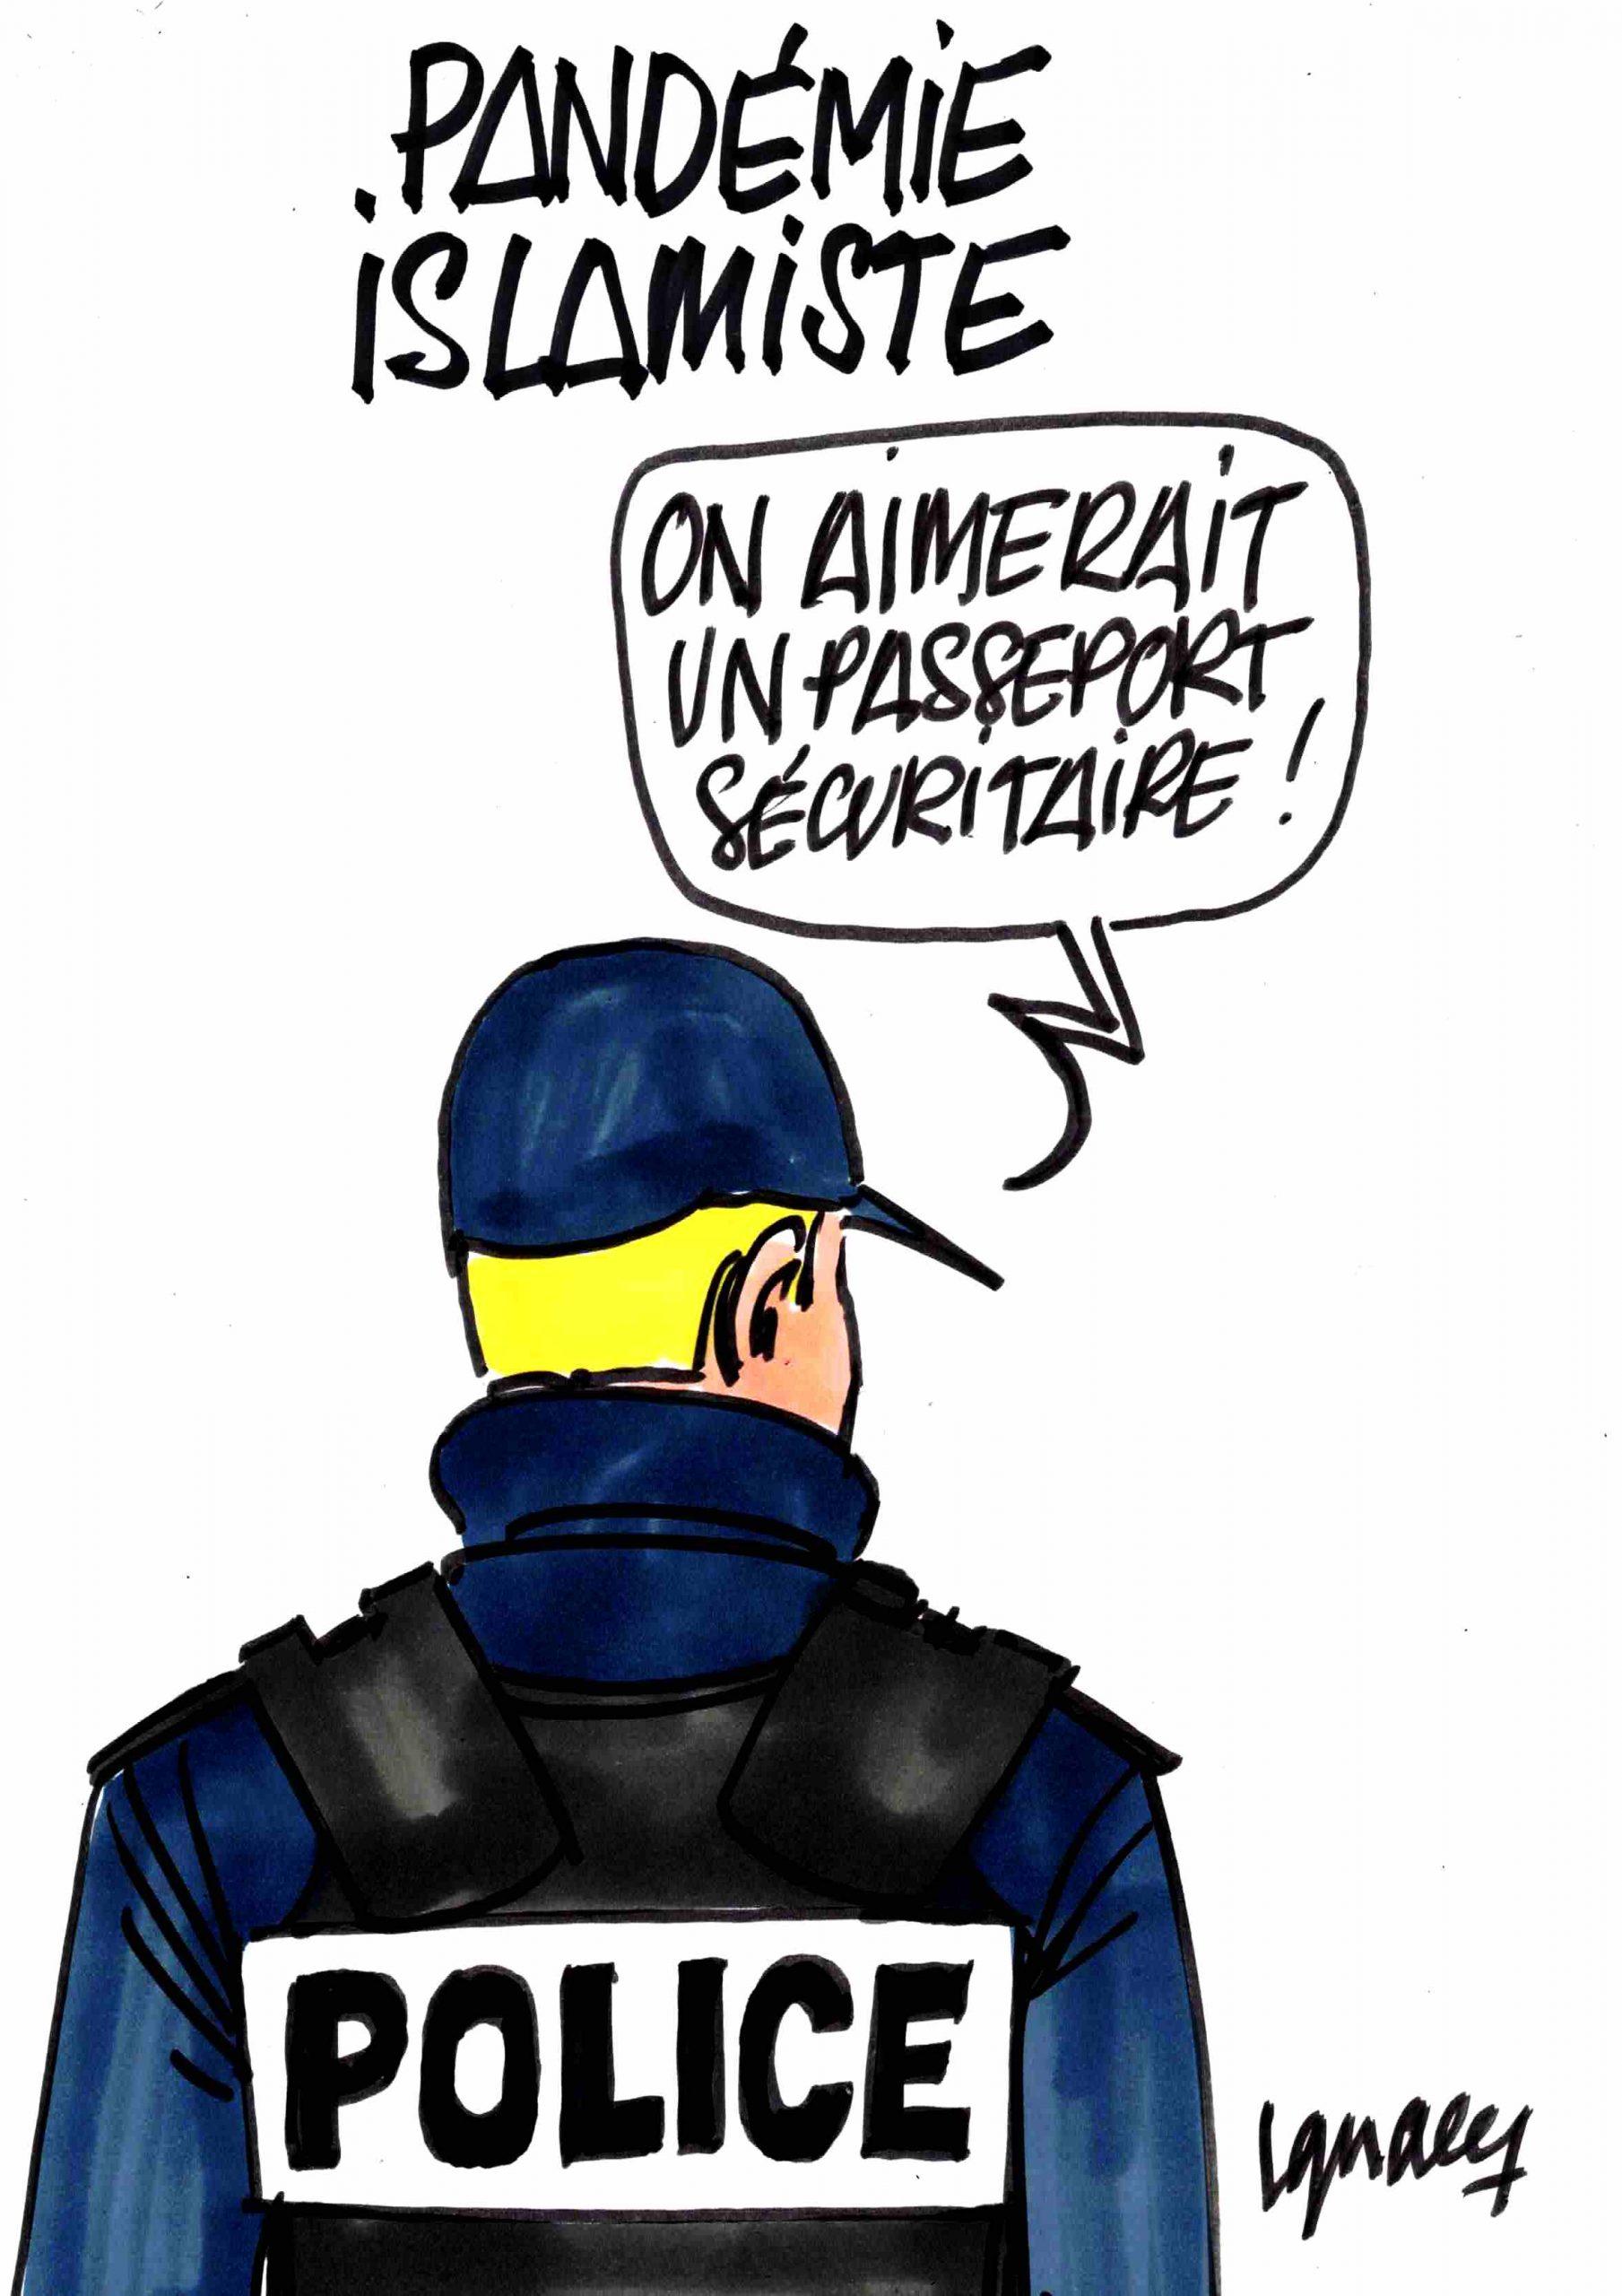 Ignace - Pandémie islamiste